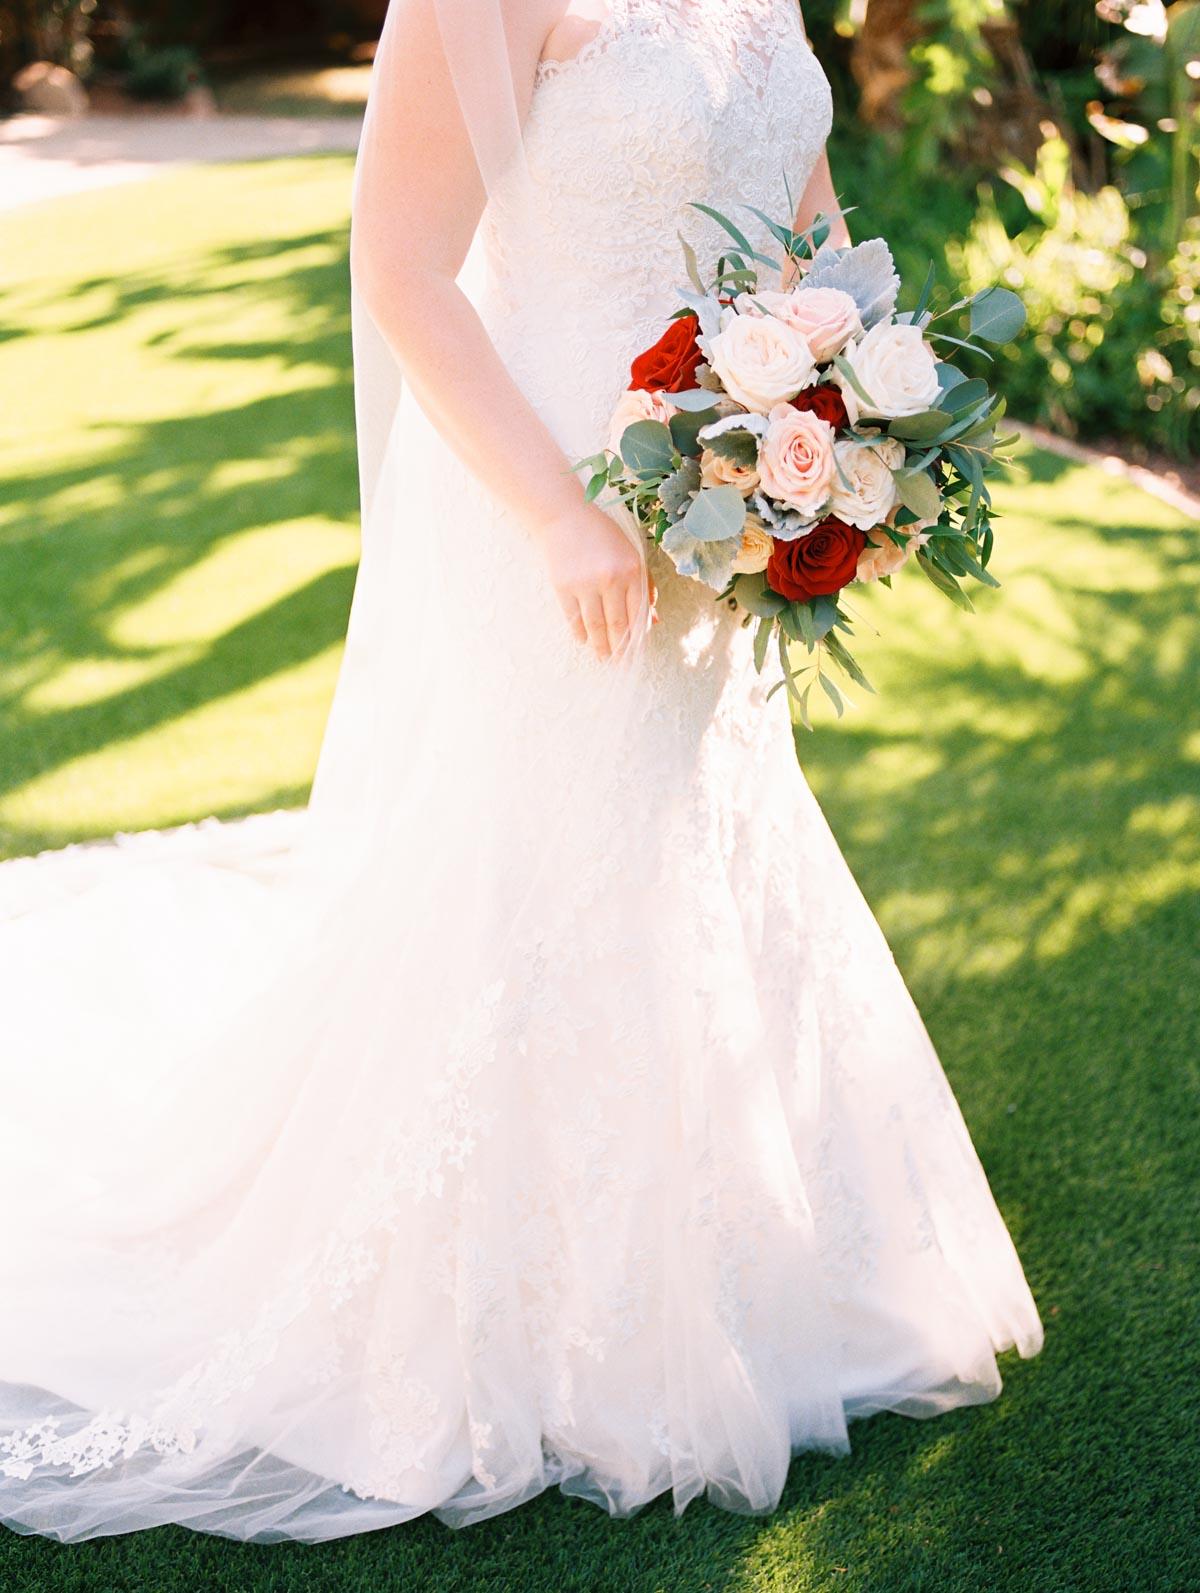 bride-holding-veil.jpg